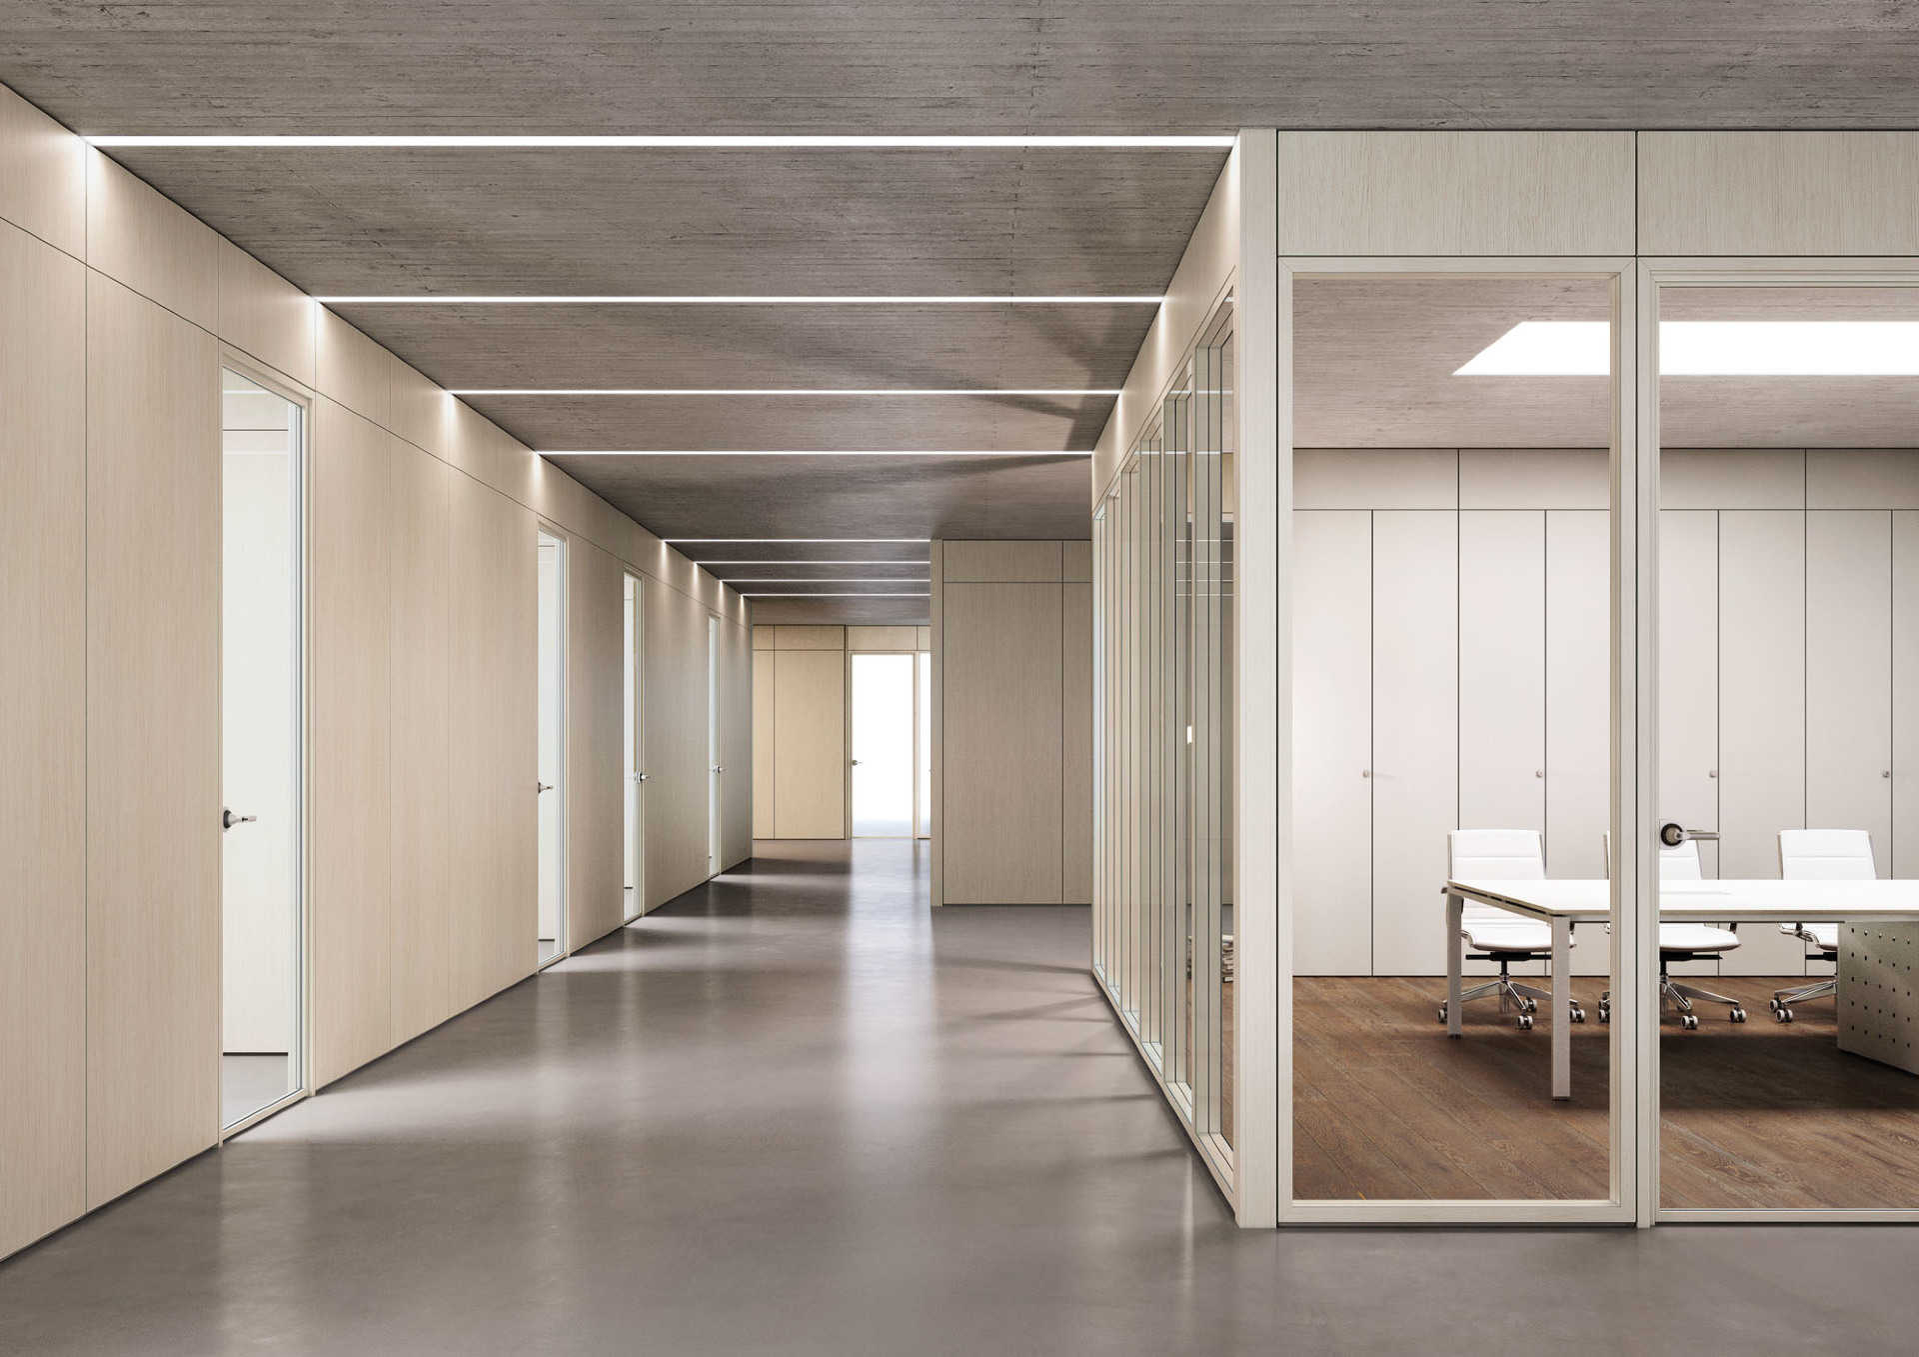 tecna-paretidivisorie-uffici-3.jpg